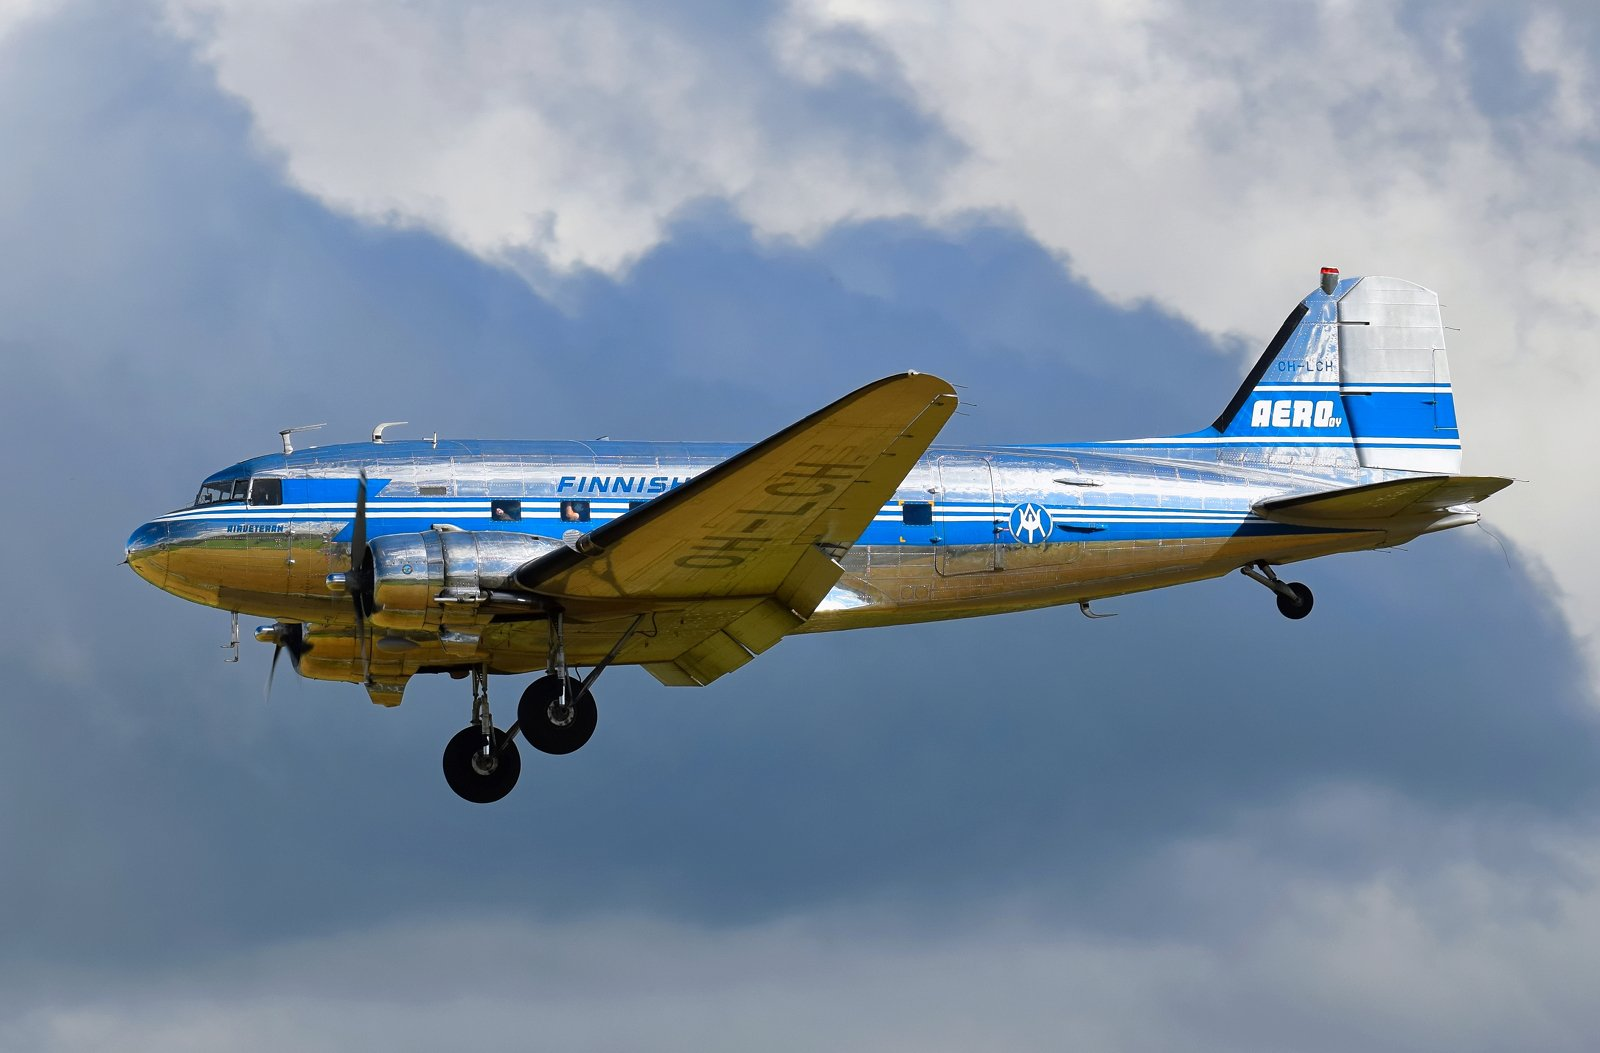 OH-LCH - Douglas DC-3 (C-53C Skytrooper) - Airveteran - 29.8.2020